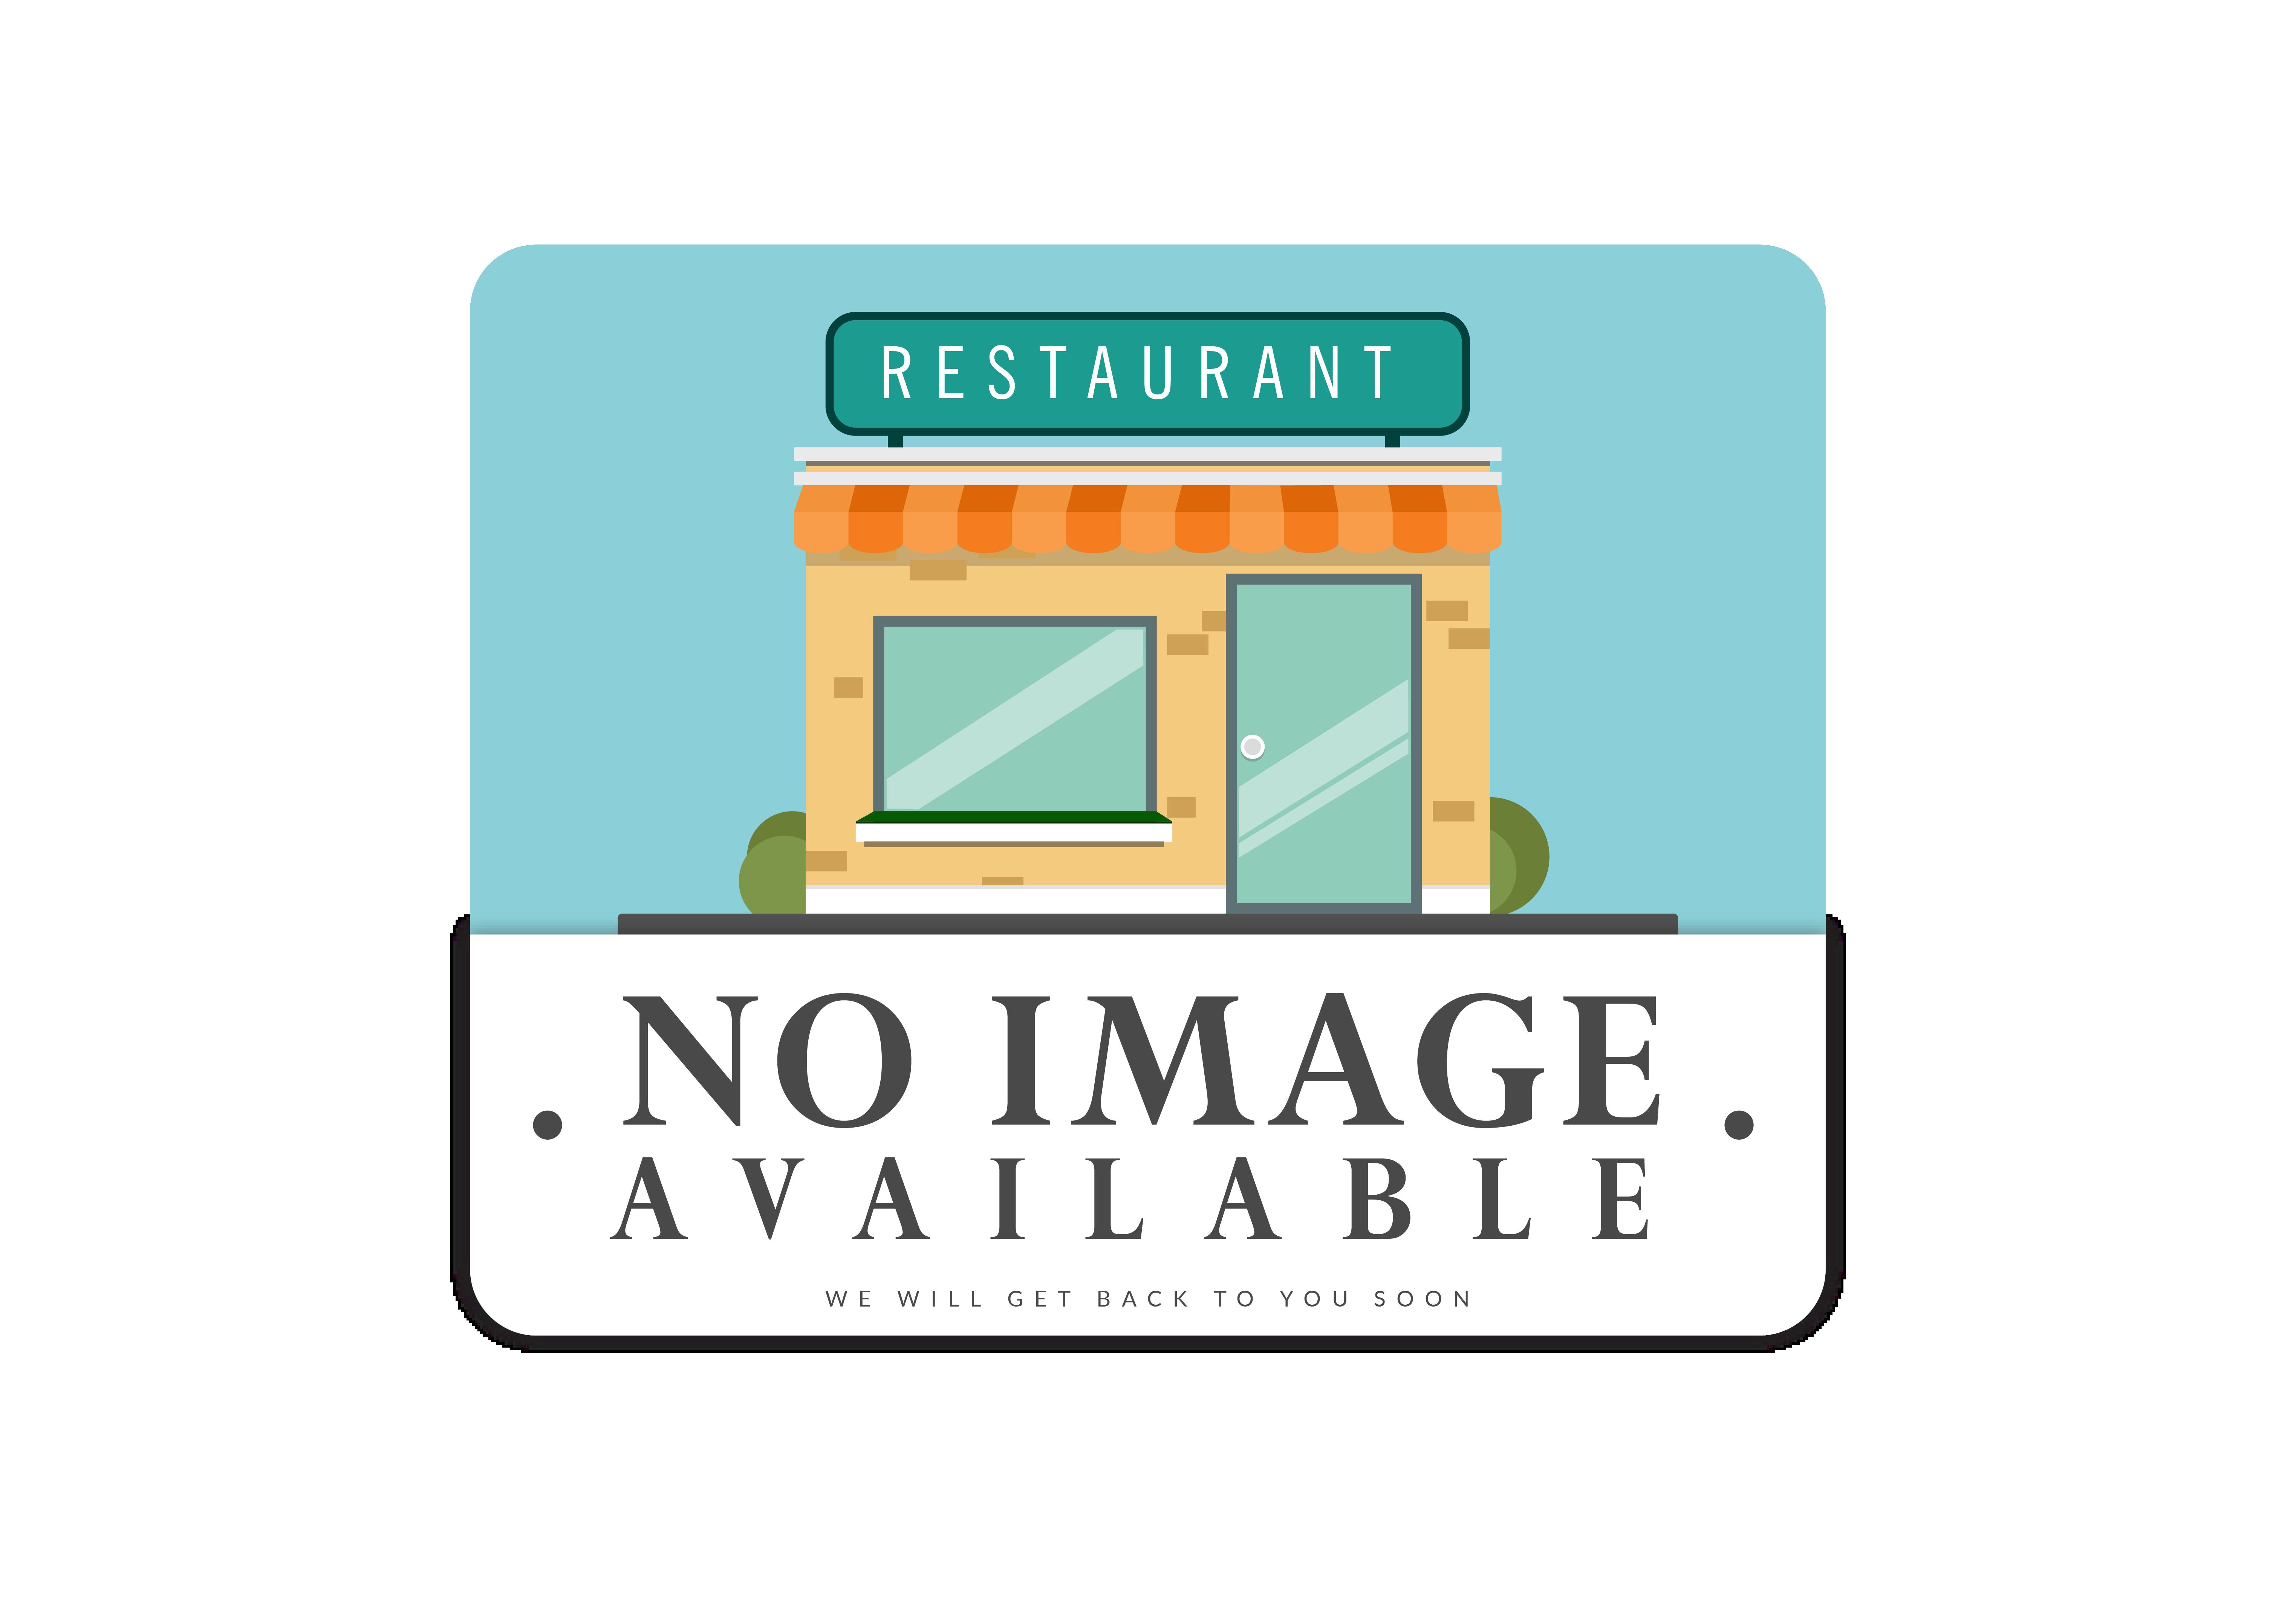 New Land Cafe